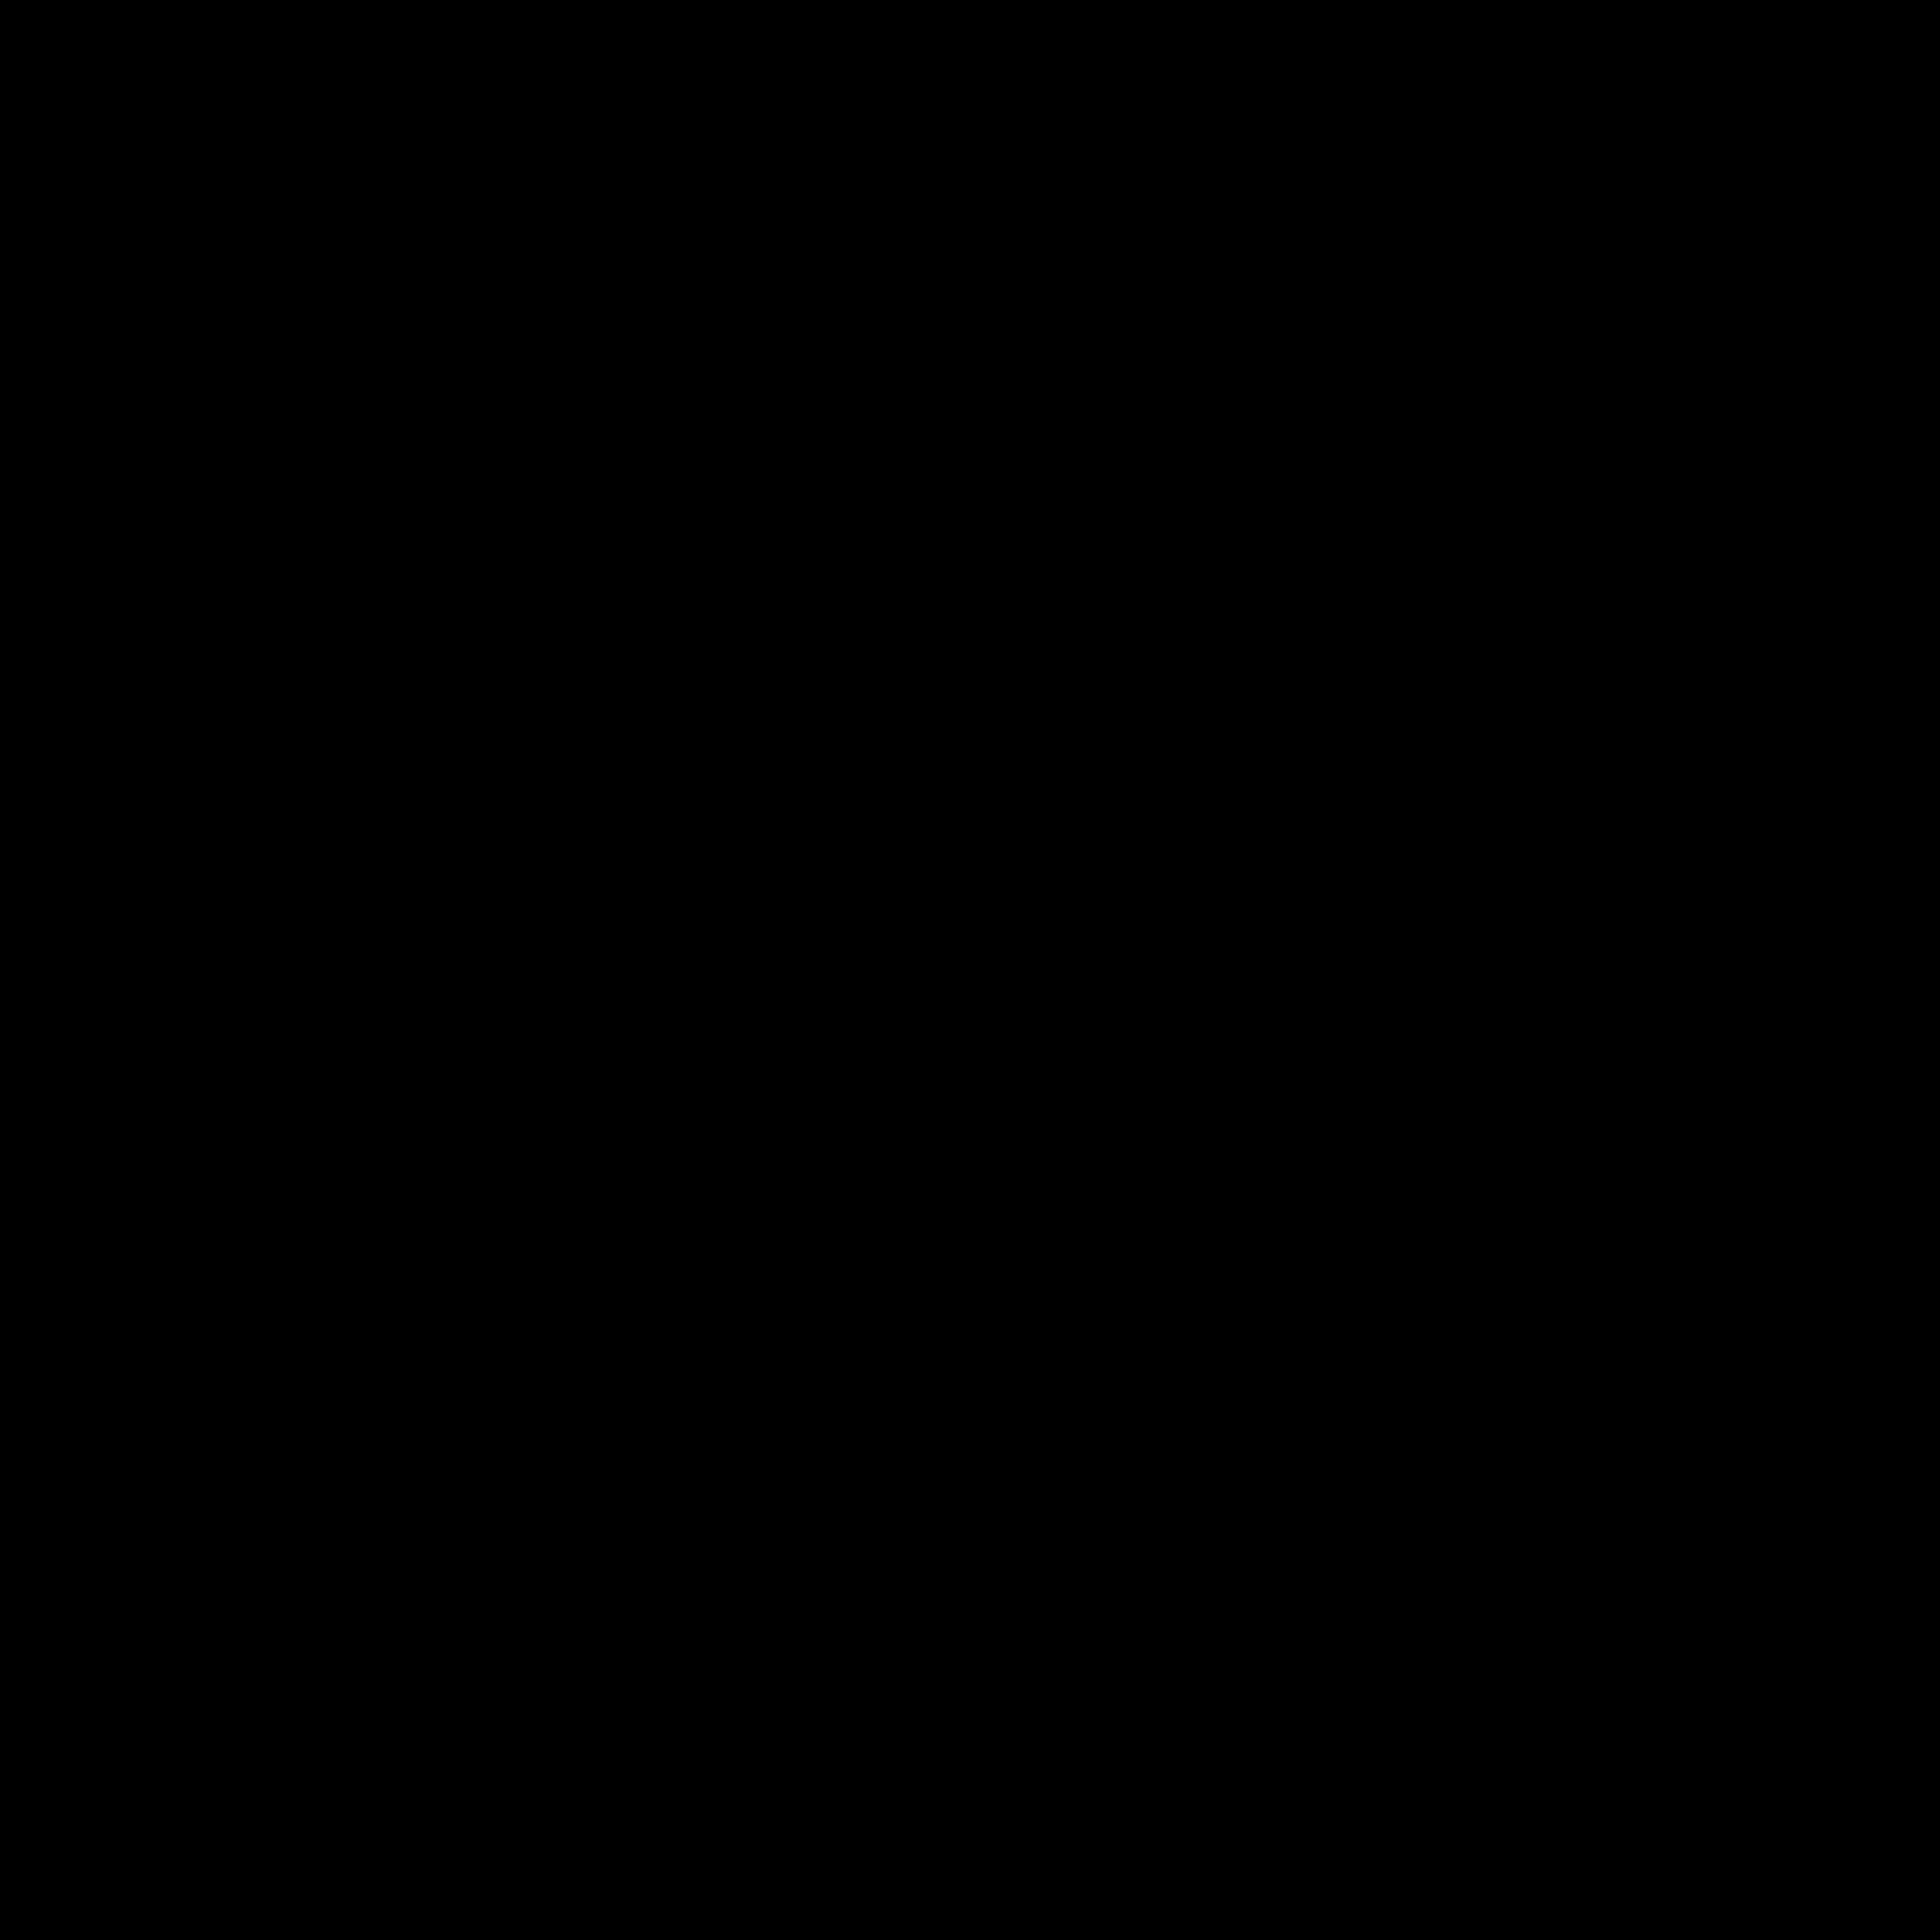 Maizena Logo PNG Transparent & SVG Vector.